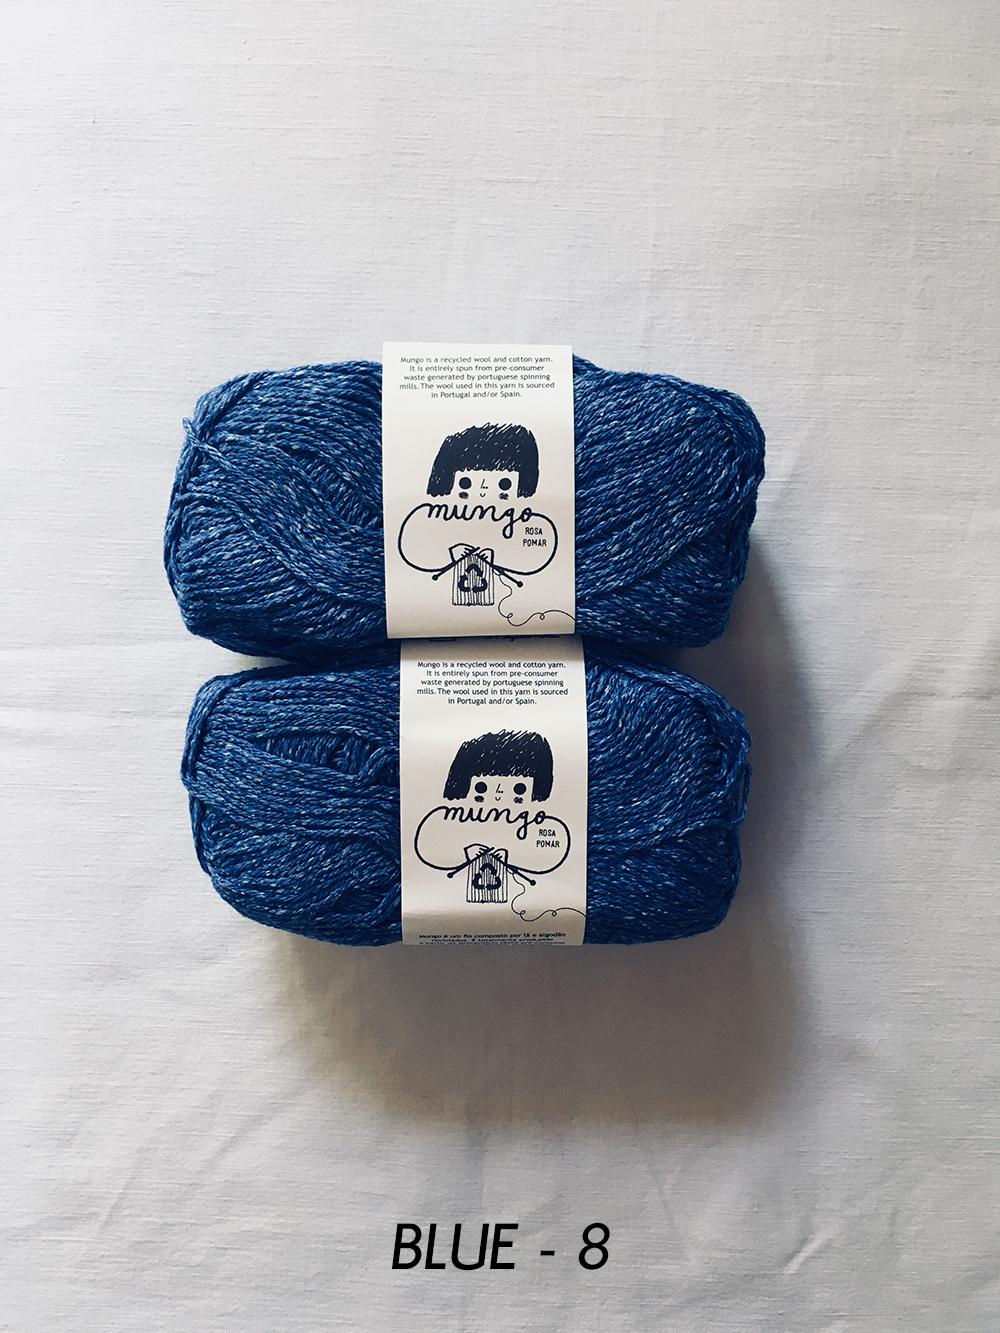 retrosaria_mungo_8_wool_done_knitting.jpg